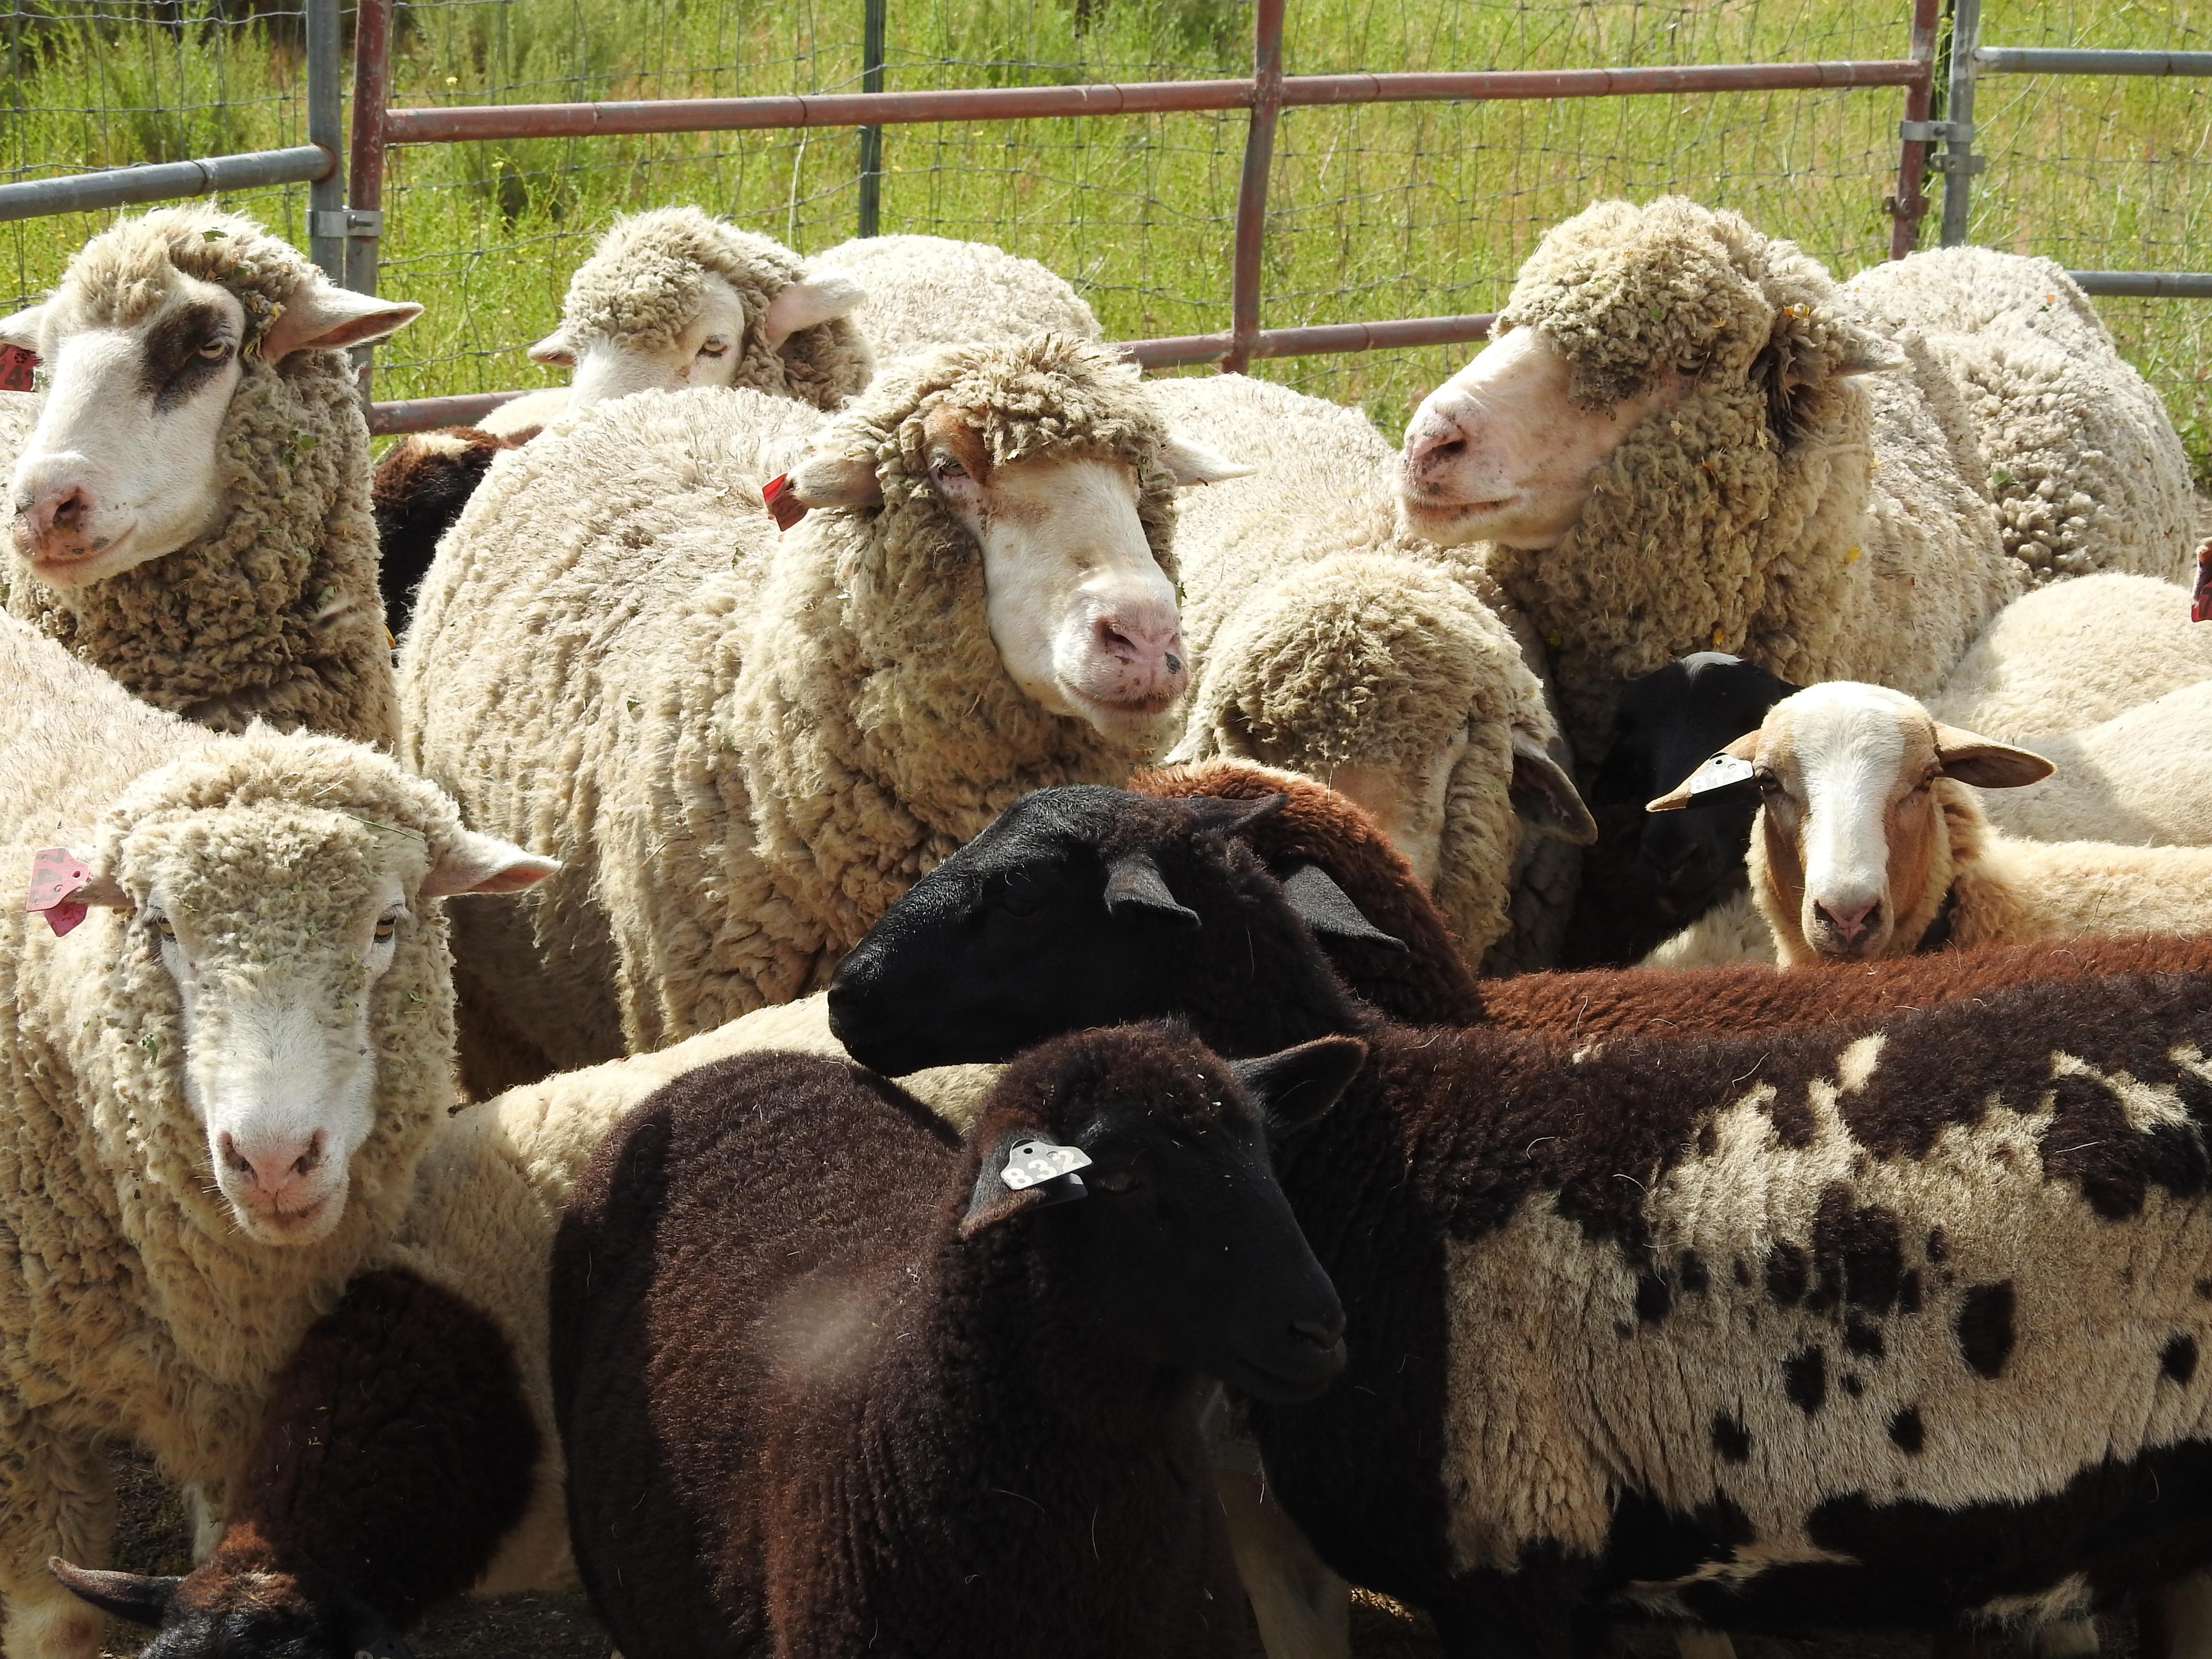 On the Lamb